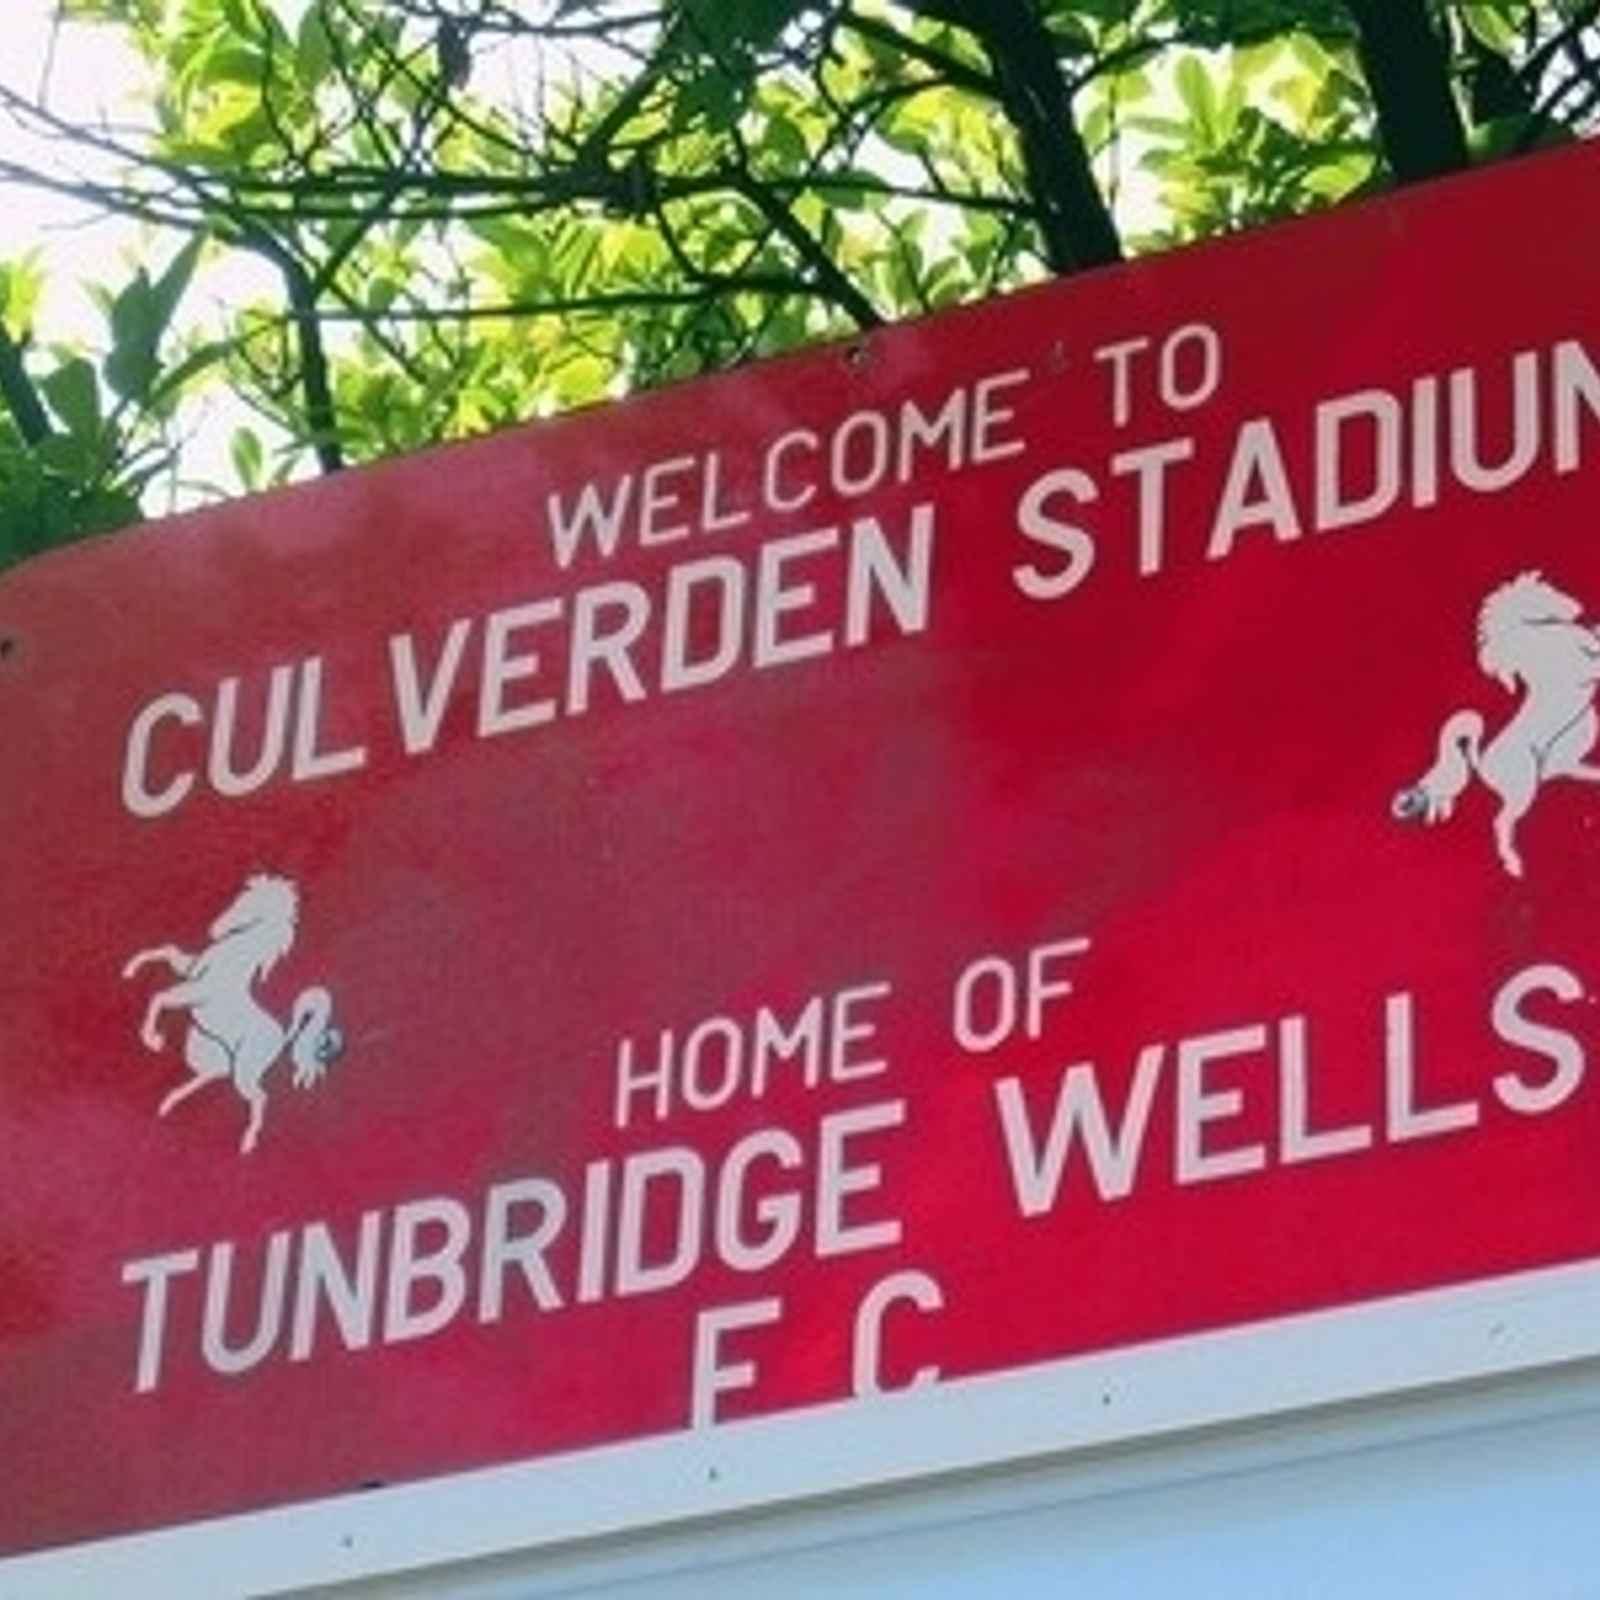 Club Coach to Tunbridge Wells Fixture